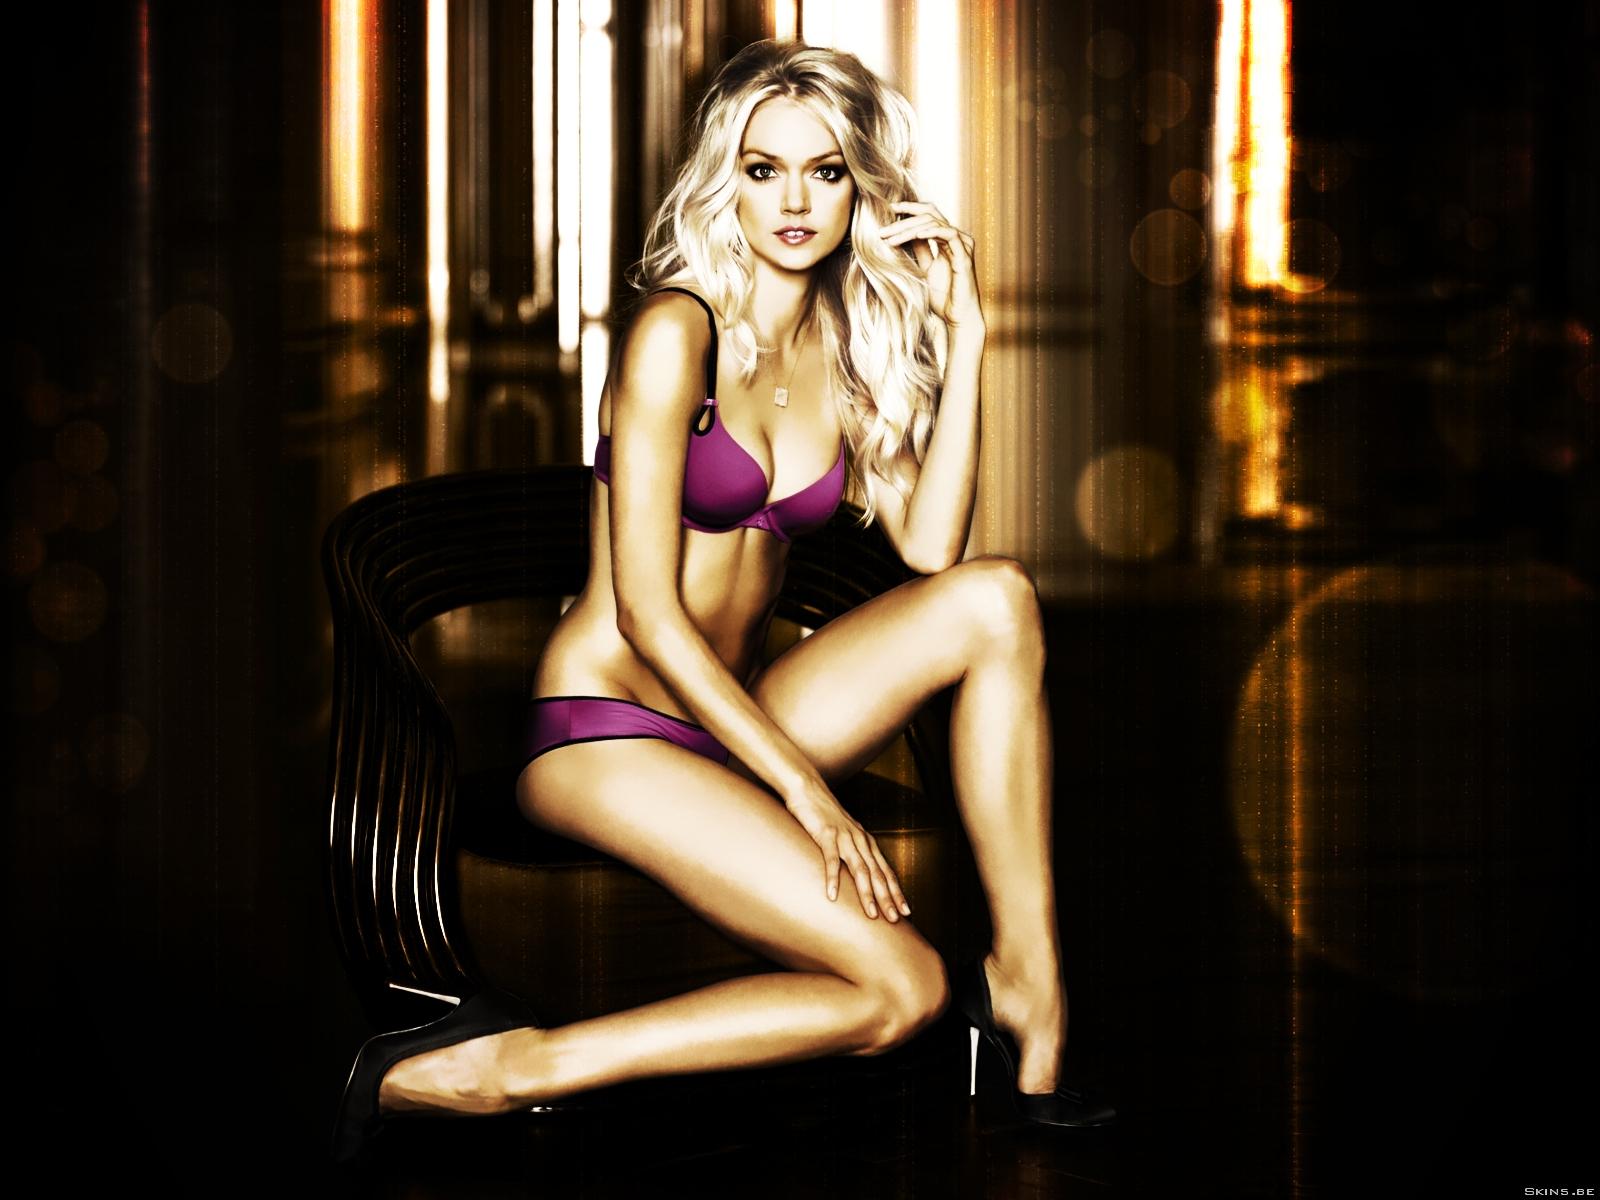 Lindsay Ellingson Bikini Wallpaper